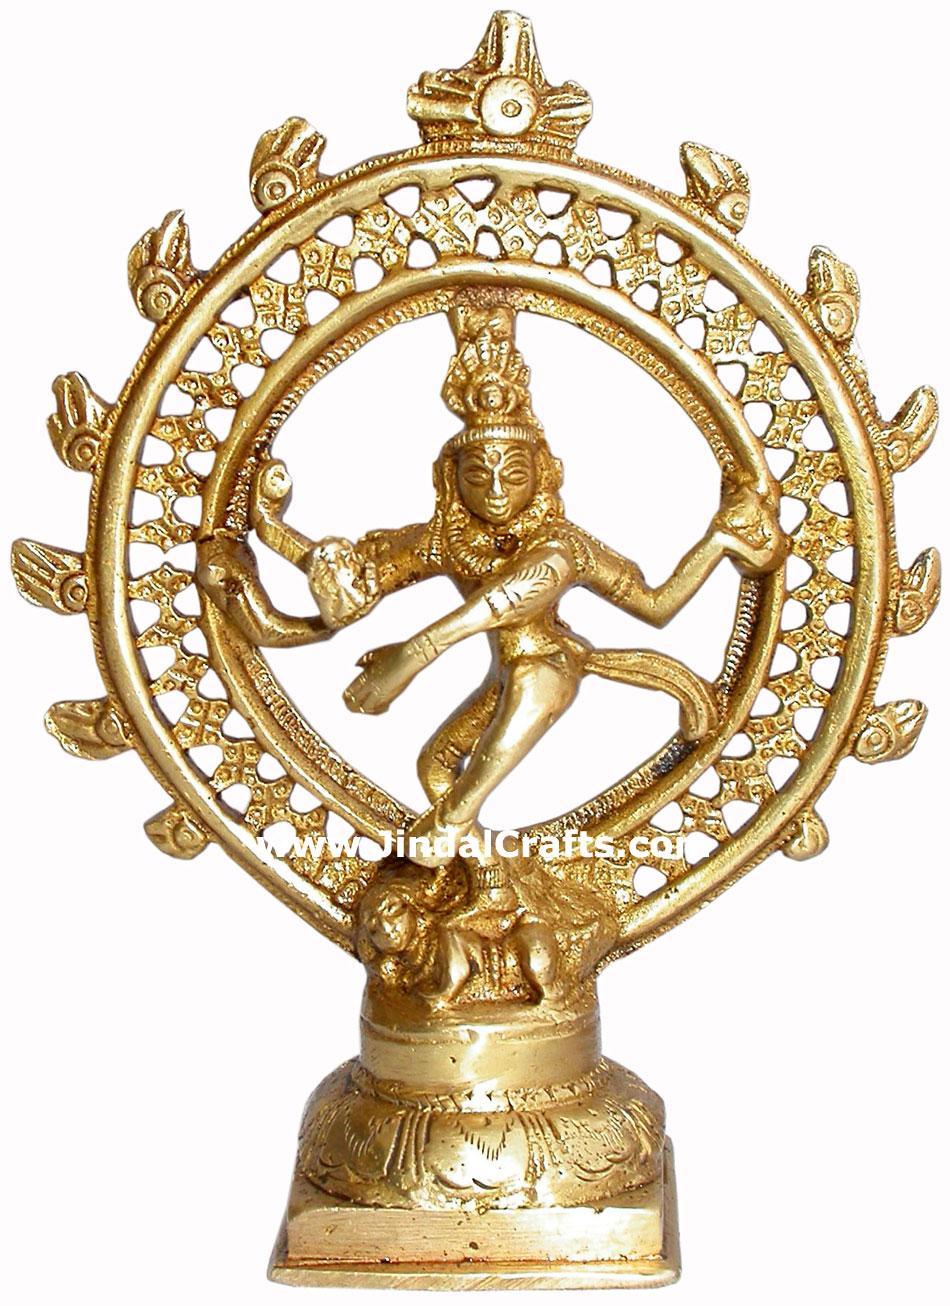 Natraja Hand Carved Indian Art Craft Handicraft Home Decor Brass Figurine